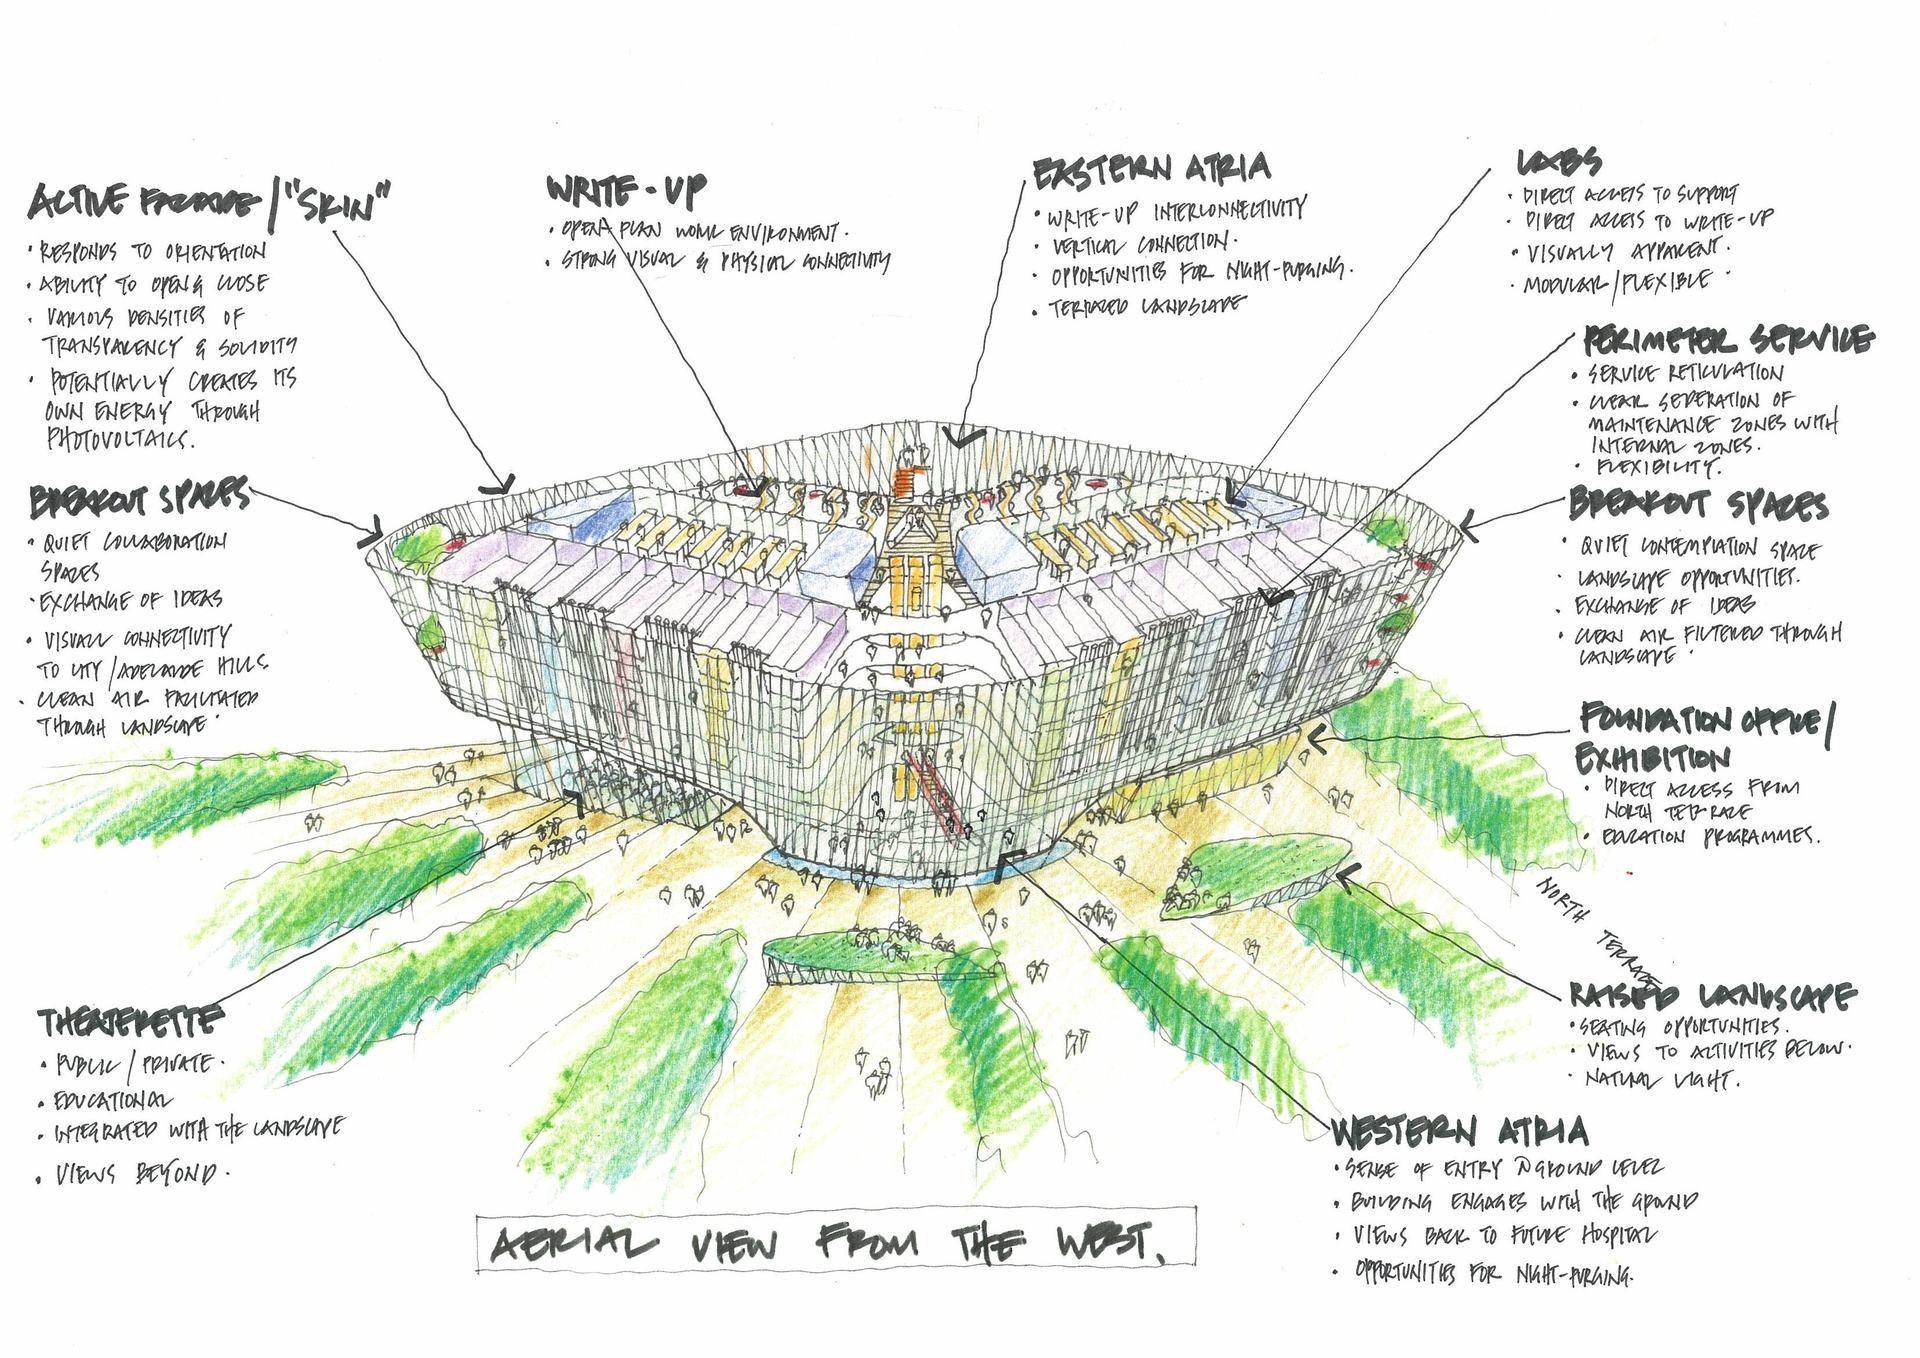 SAHMRI building function concept diagram